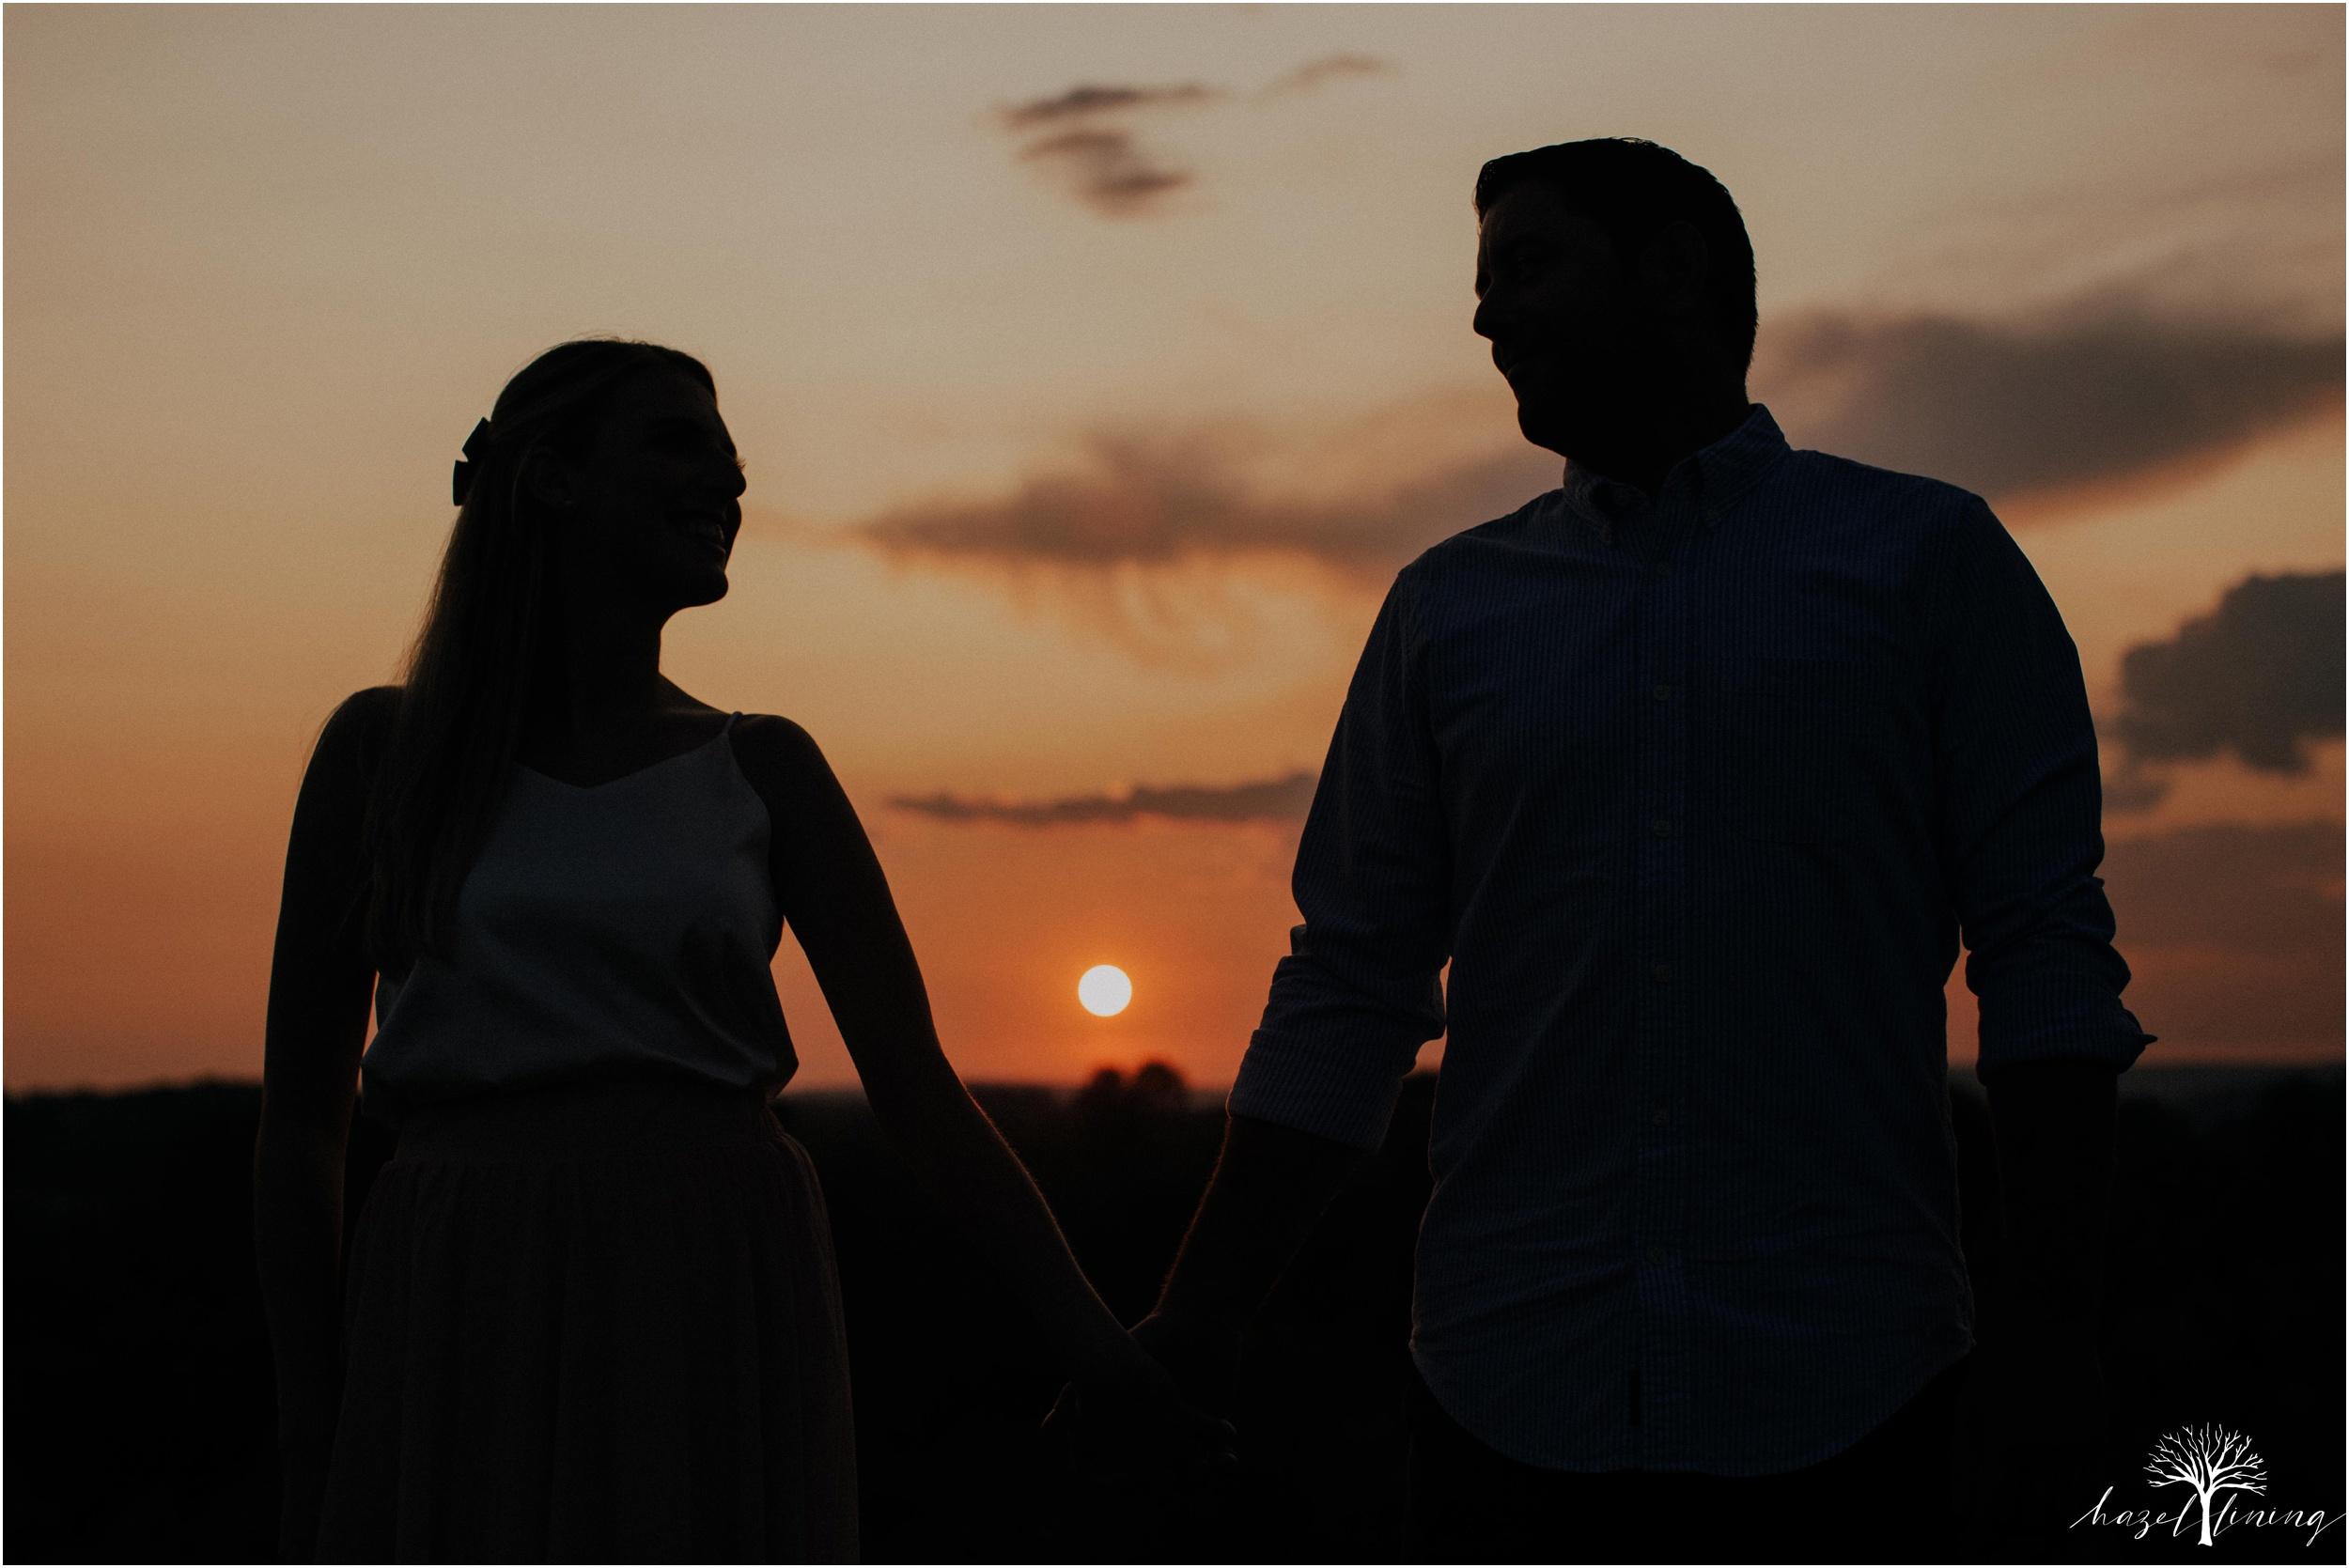 ashley-fillmore-steve-reimer-trexler-nature-preserve-summer-engagement-session-schnecksville-pennsylvania-hazel-lining-photography-destination-elopement-wedding-engagement-photography_0066.jpg